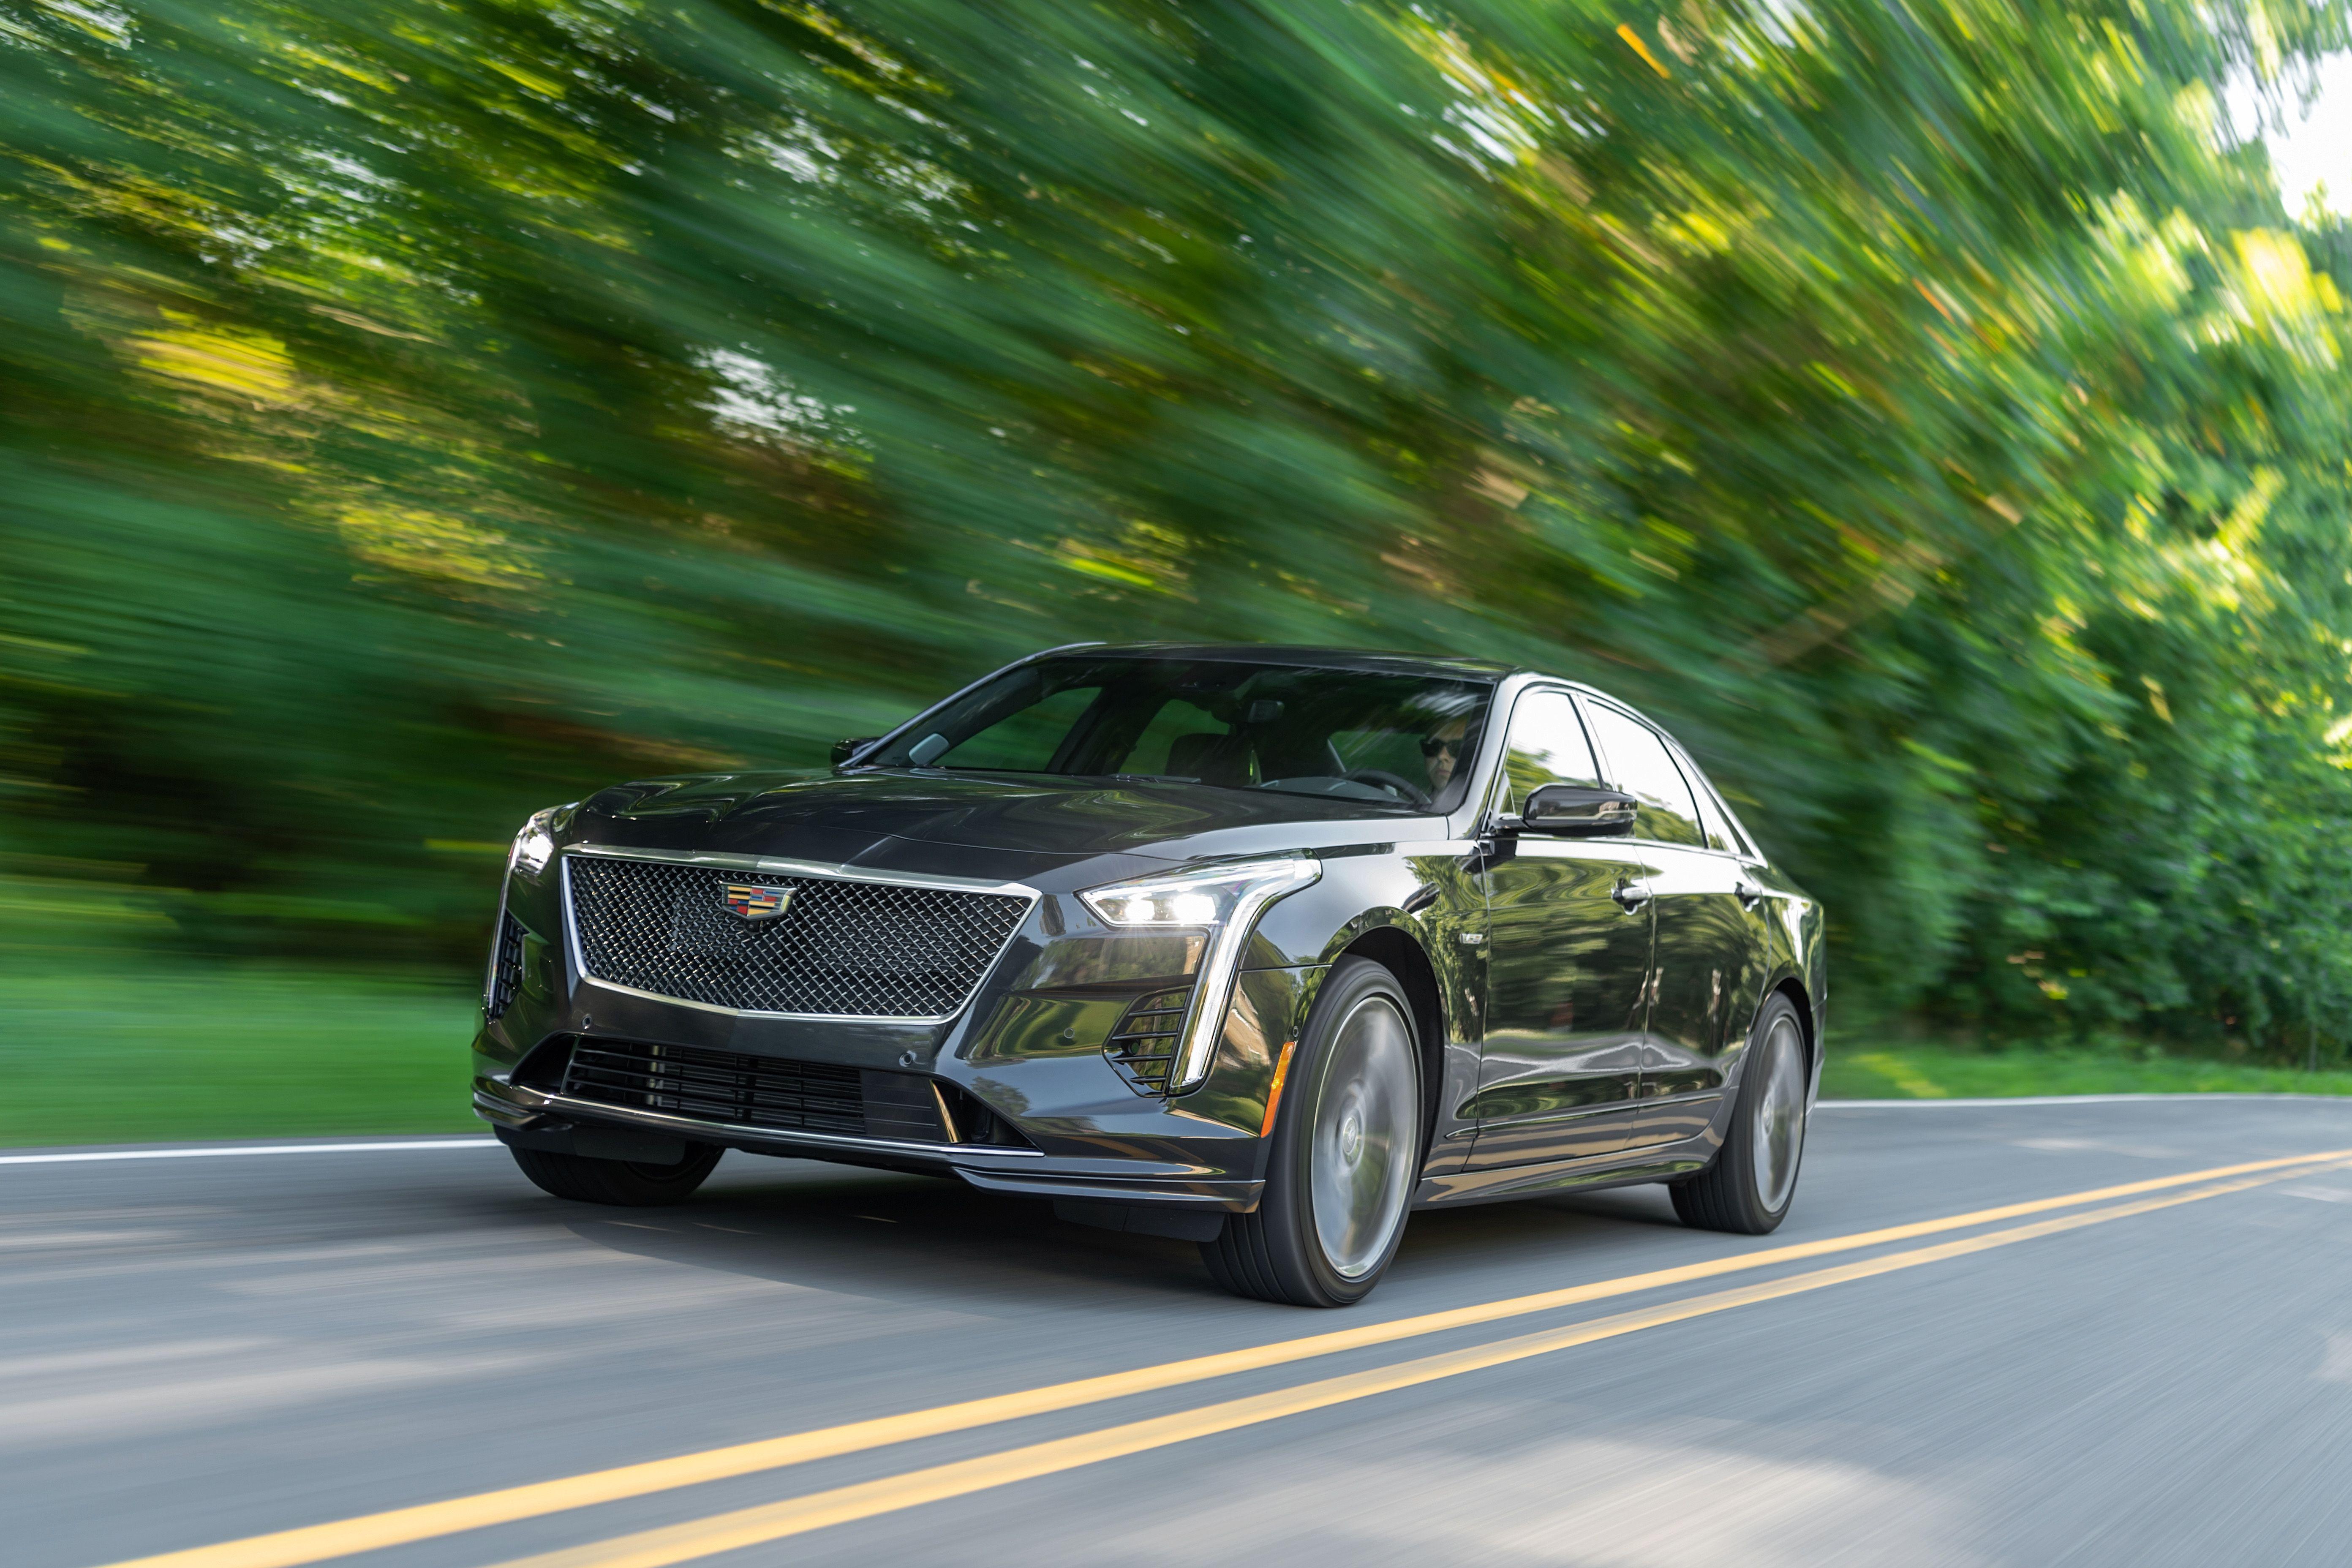 2020 Cadillac CT6 Configurations